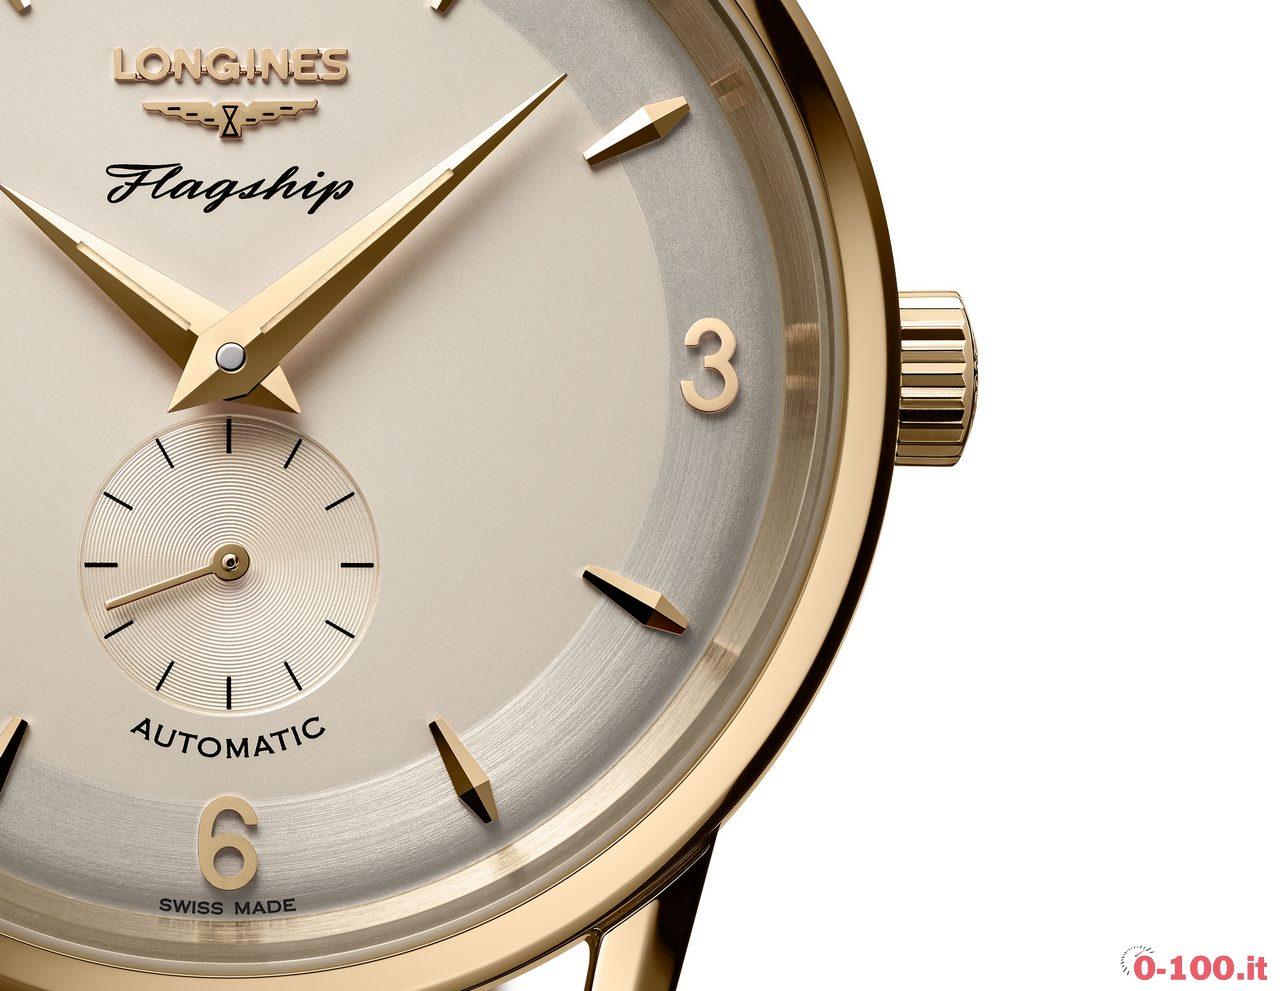 anteprima-baselworld-2017-longines-flagship-heritage-60th-anniversary-1957-2017_0-1003